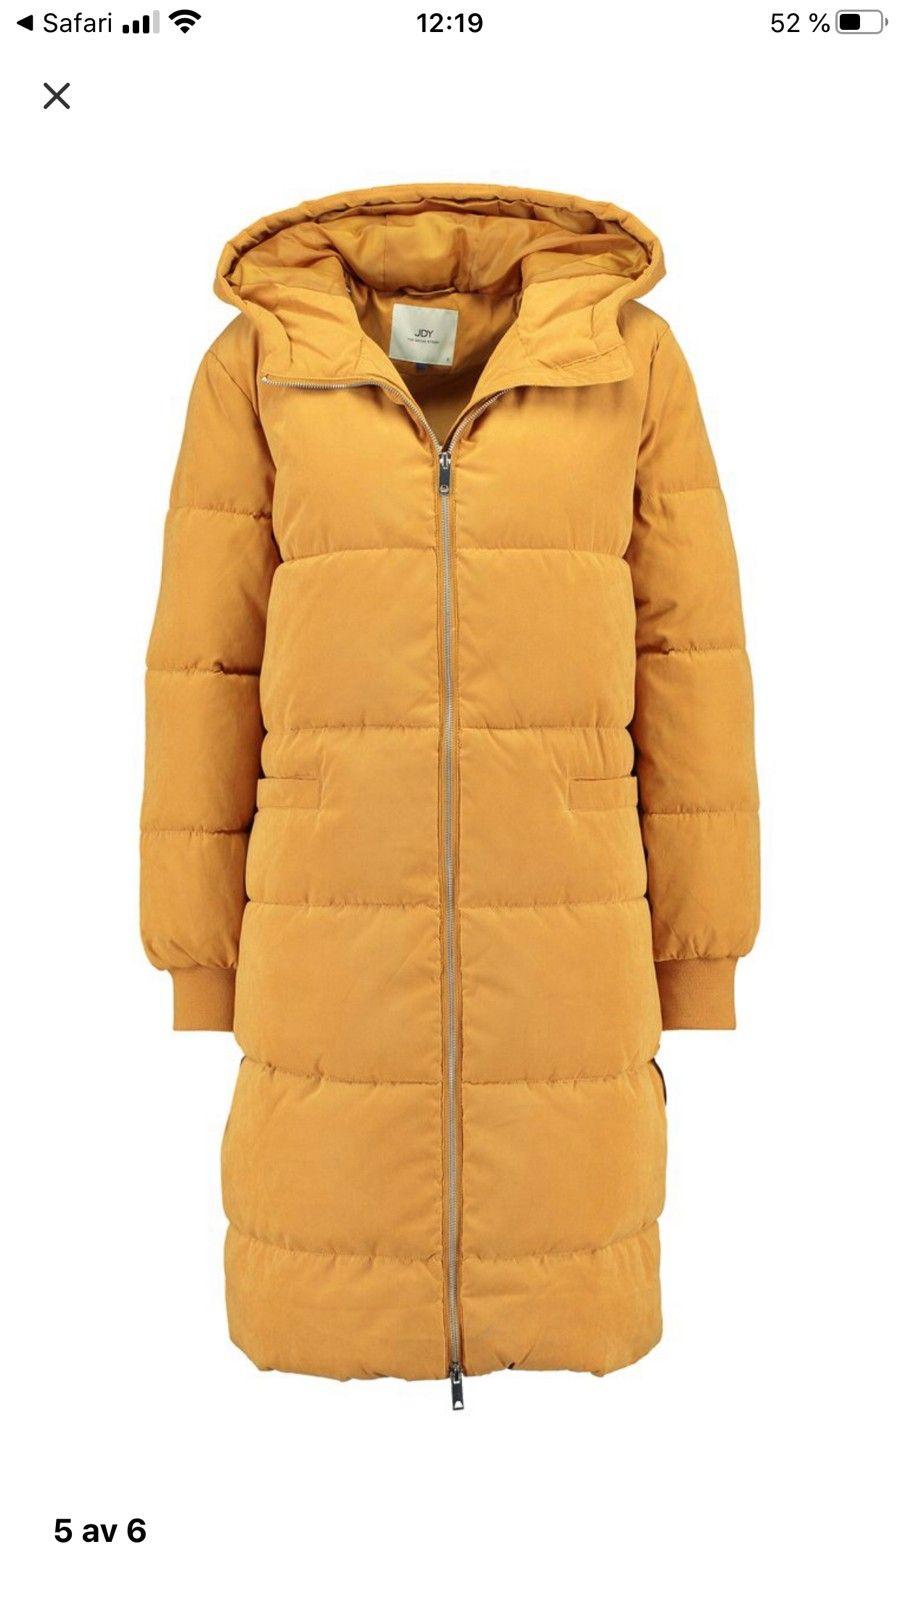 Ny jakke selges | FINN.no